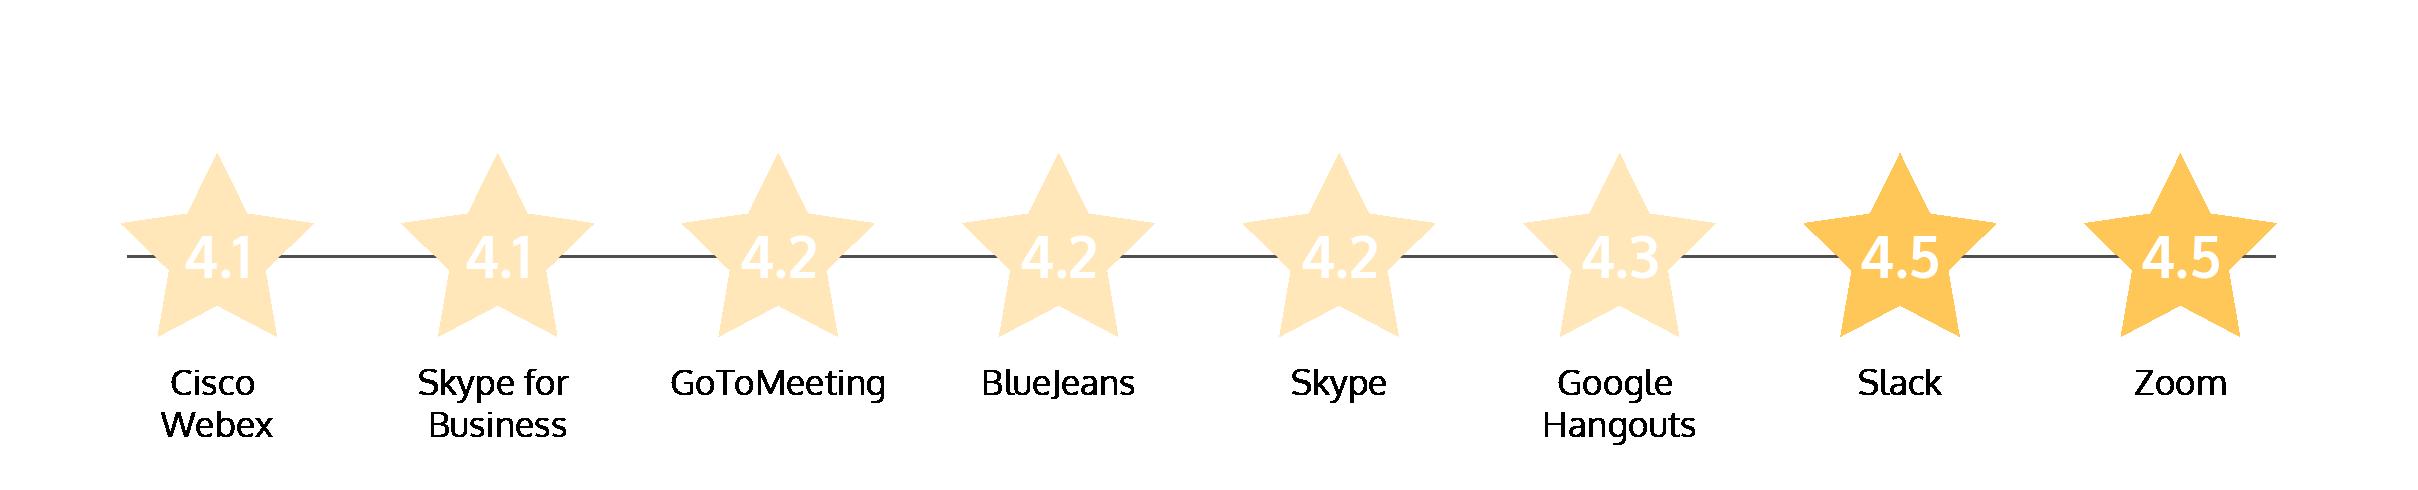 sovc-g2-rating.png